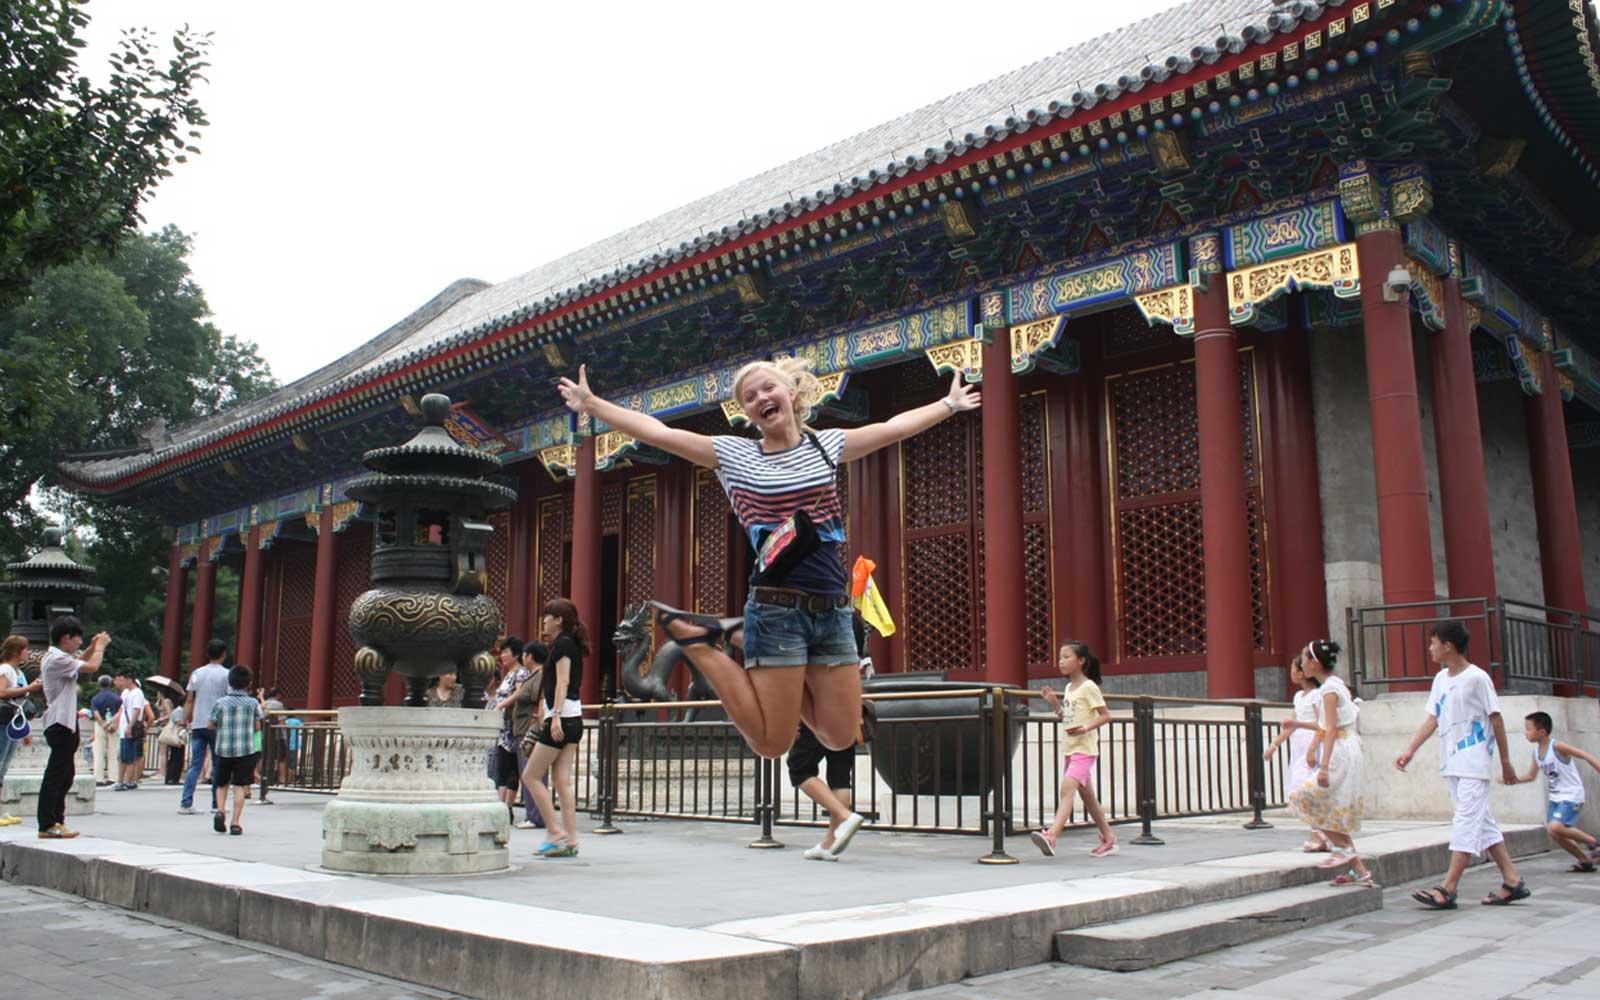 Hanna vor dem Sommerpalast bei Beijing